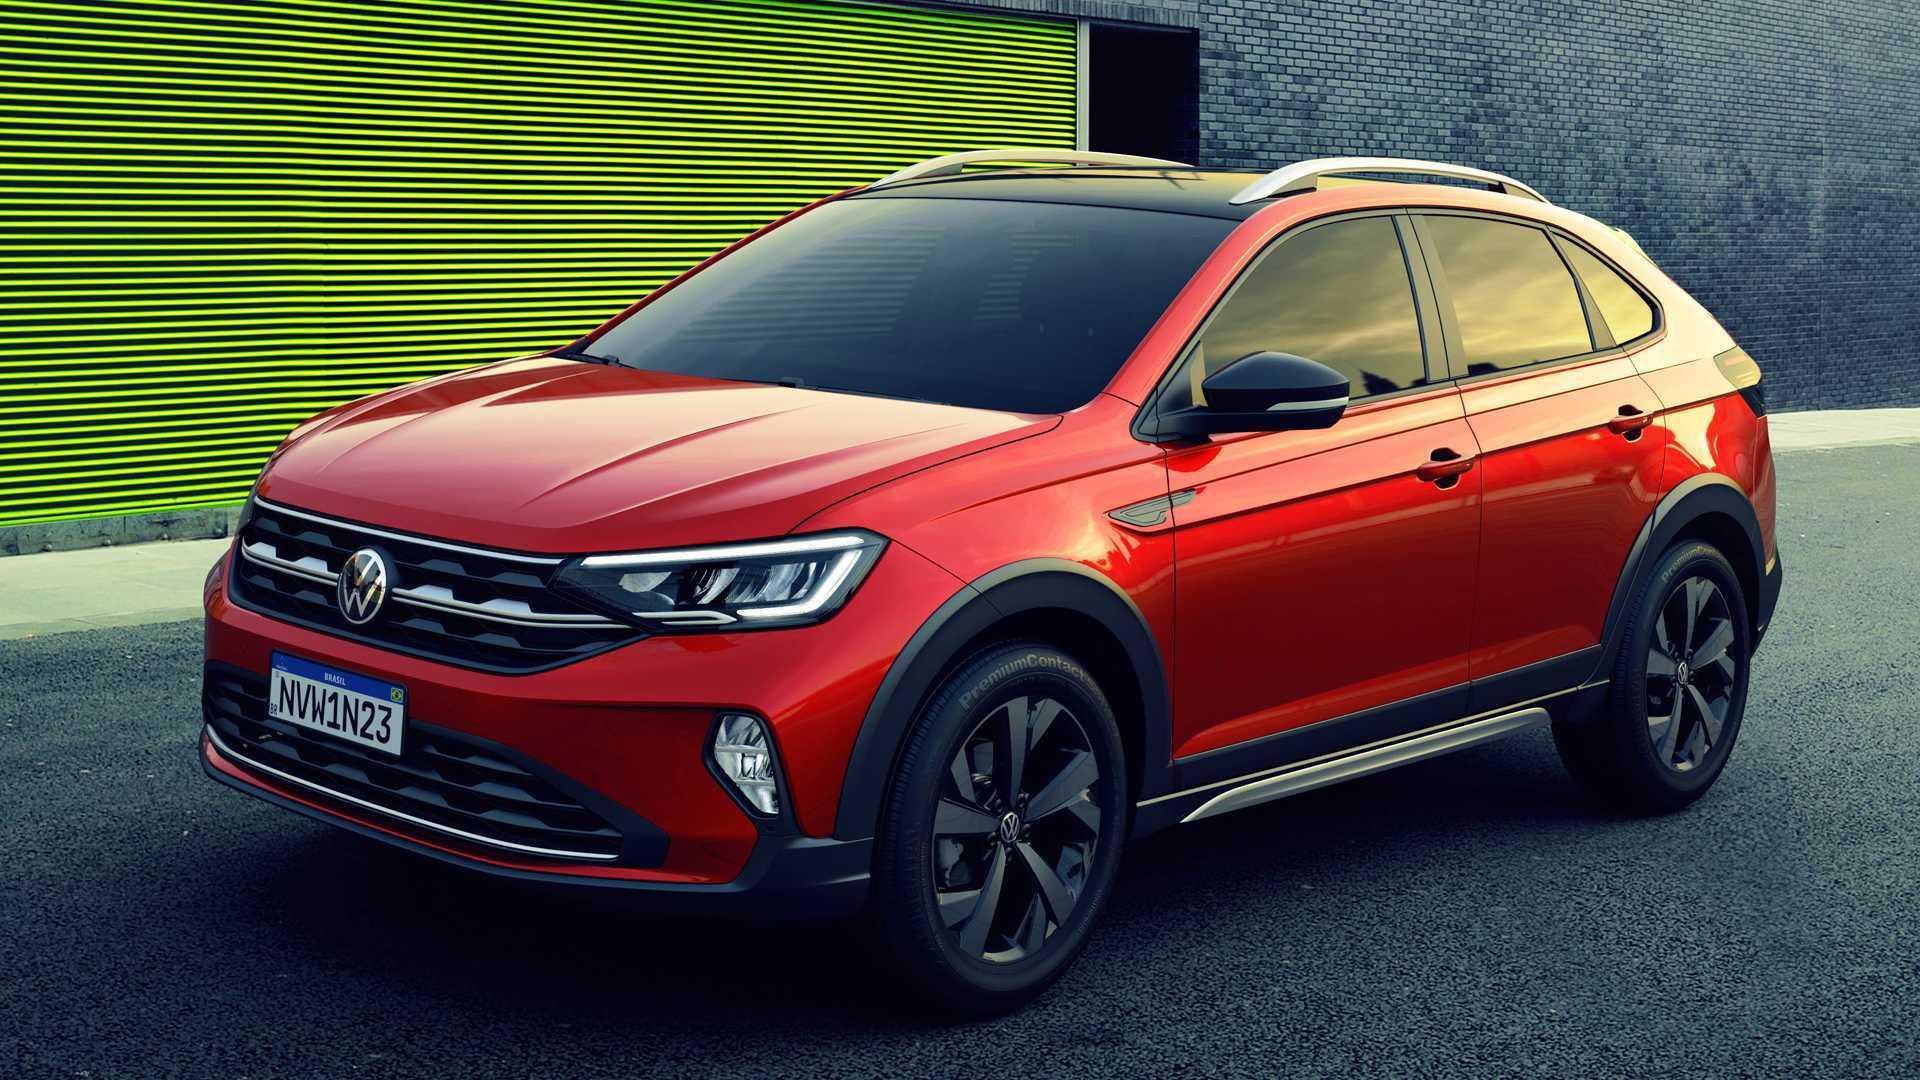 VW Nivus (2020): Der schicke Brasilien-Bruder des T-Cross